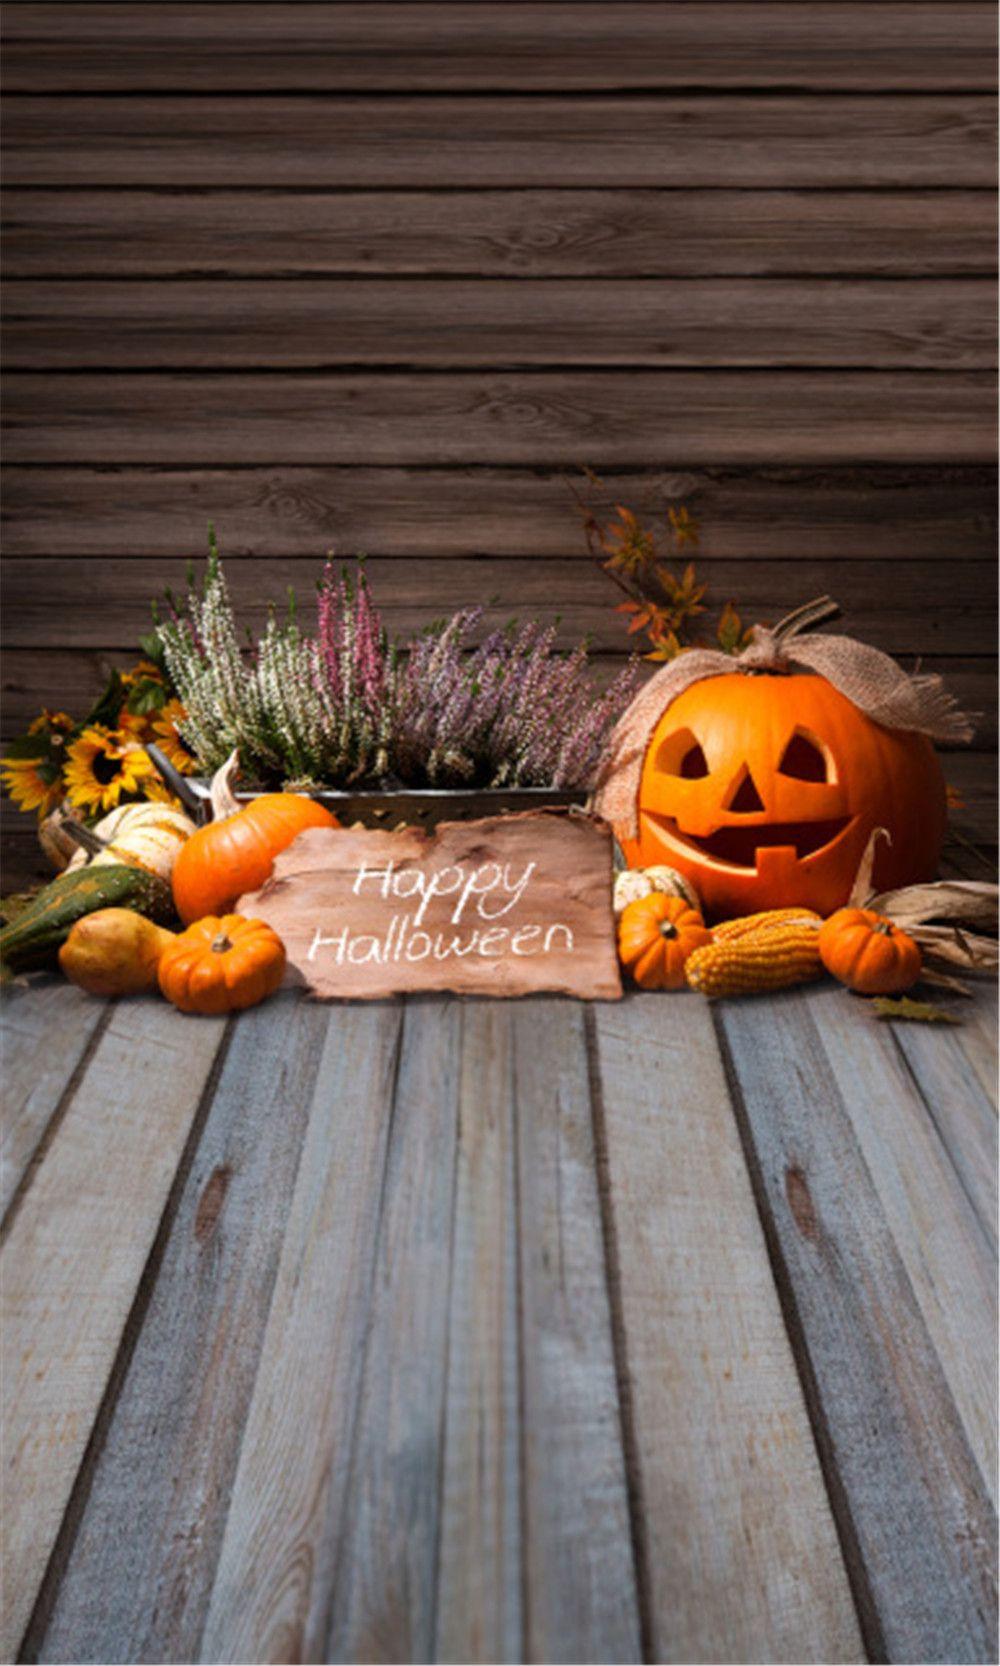 2018 happy halloween backdrop plank wood flooring pumpkin lantern baby newborn studio photo shoot props printed wooden wall photography backdrops from